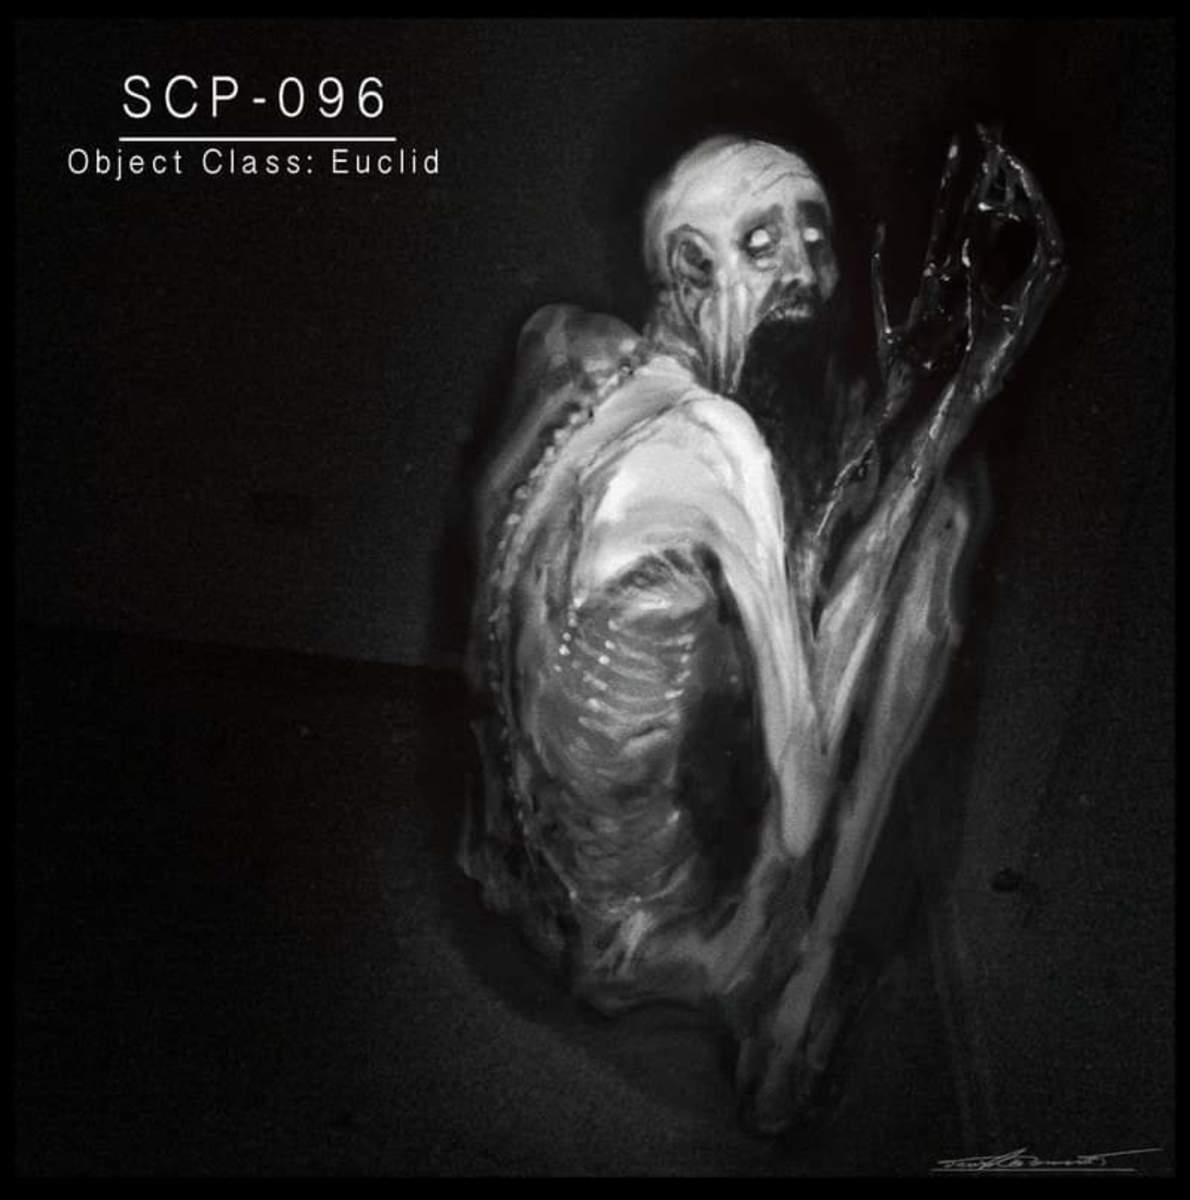 SCP-096, illustration created by David Romero on Artstation